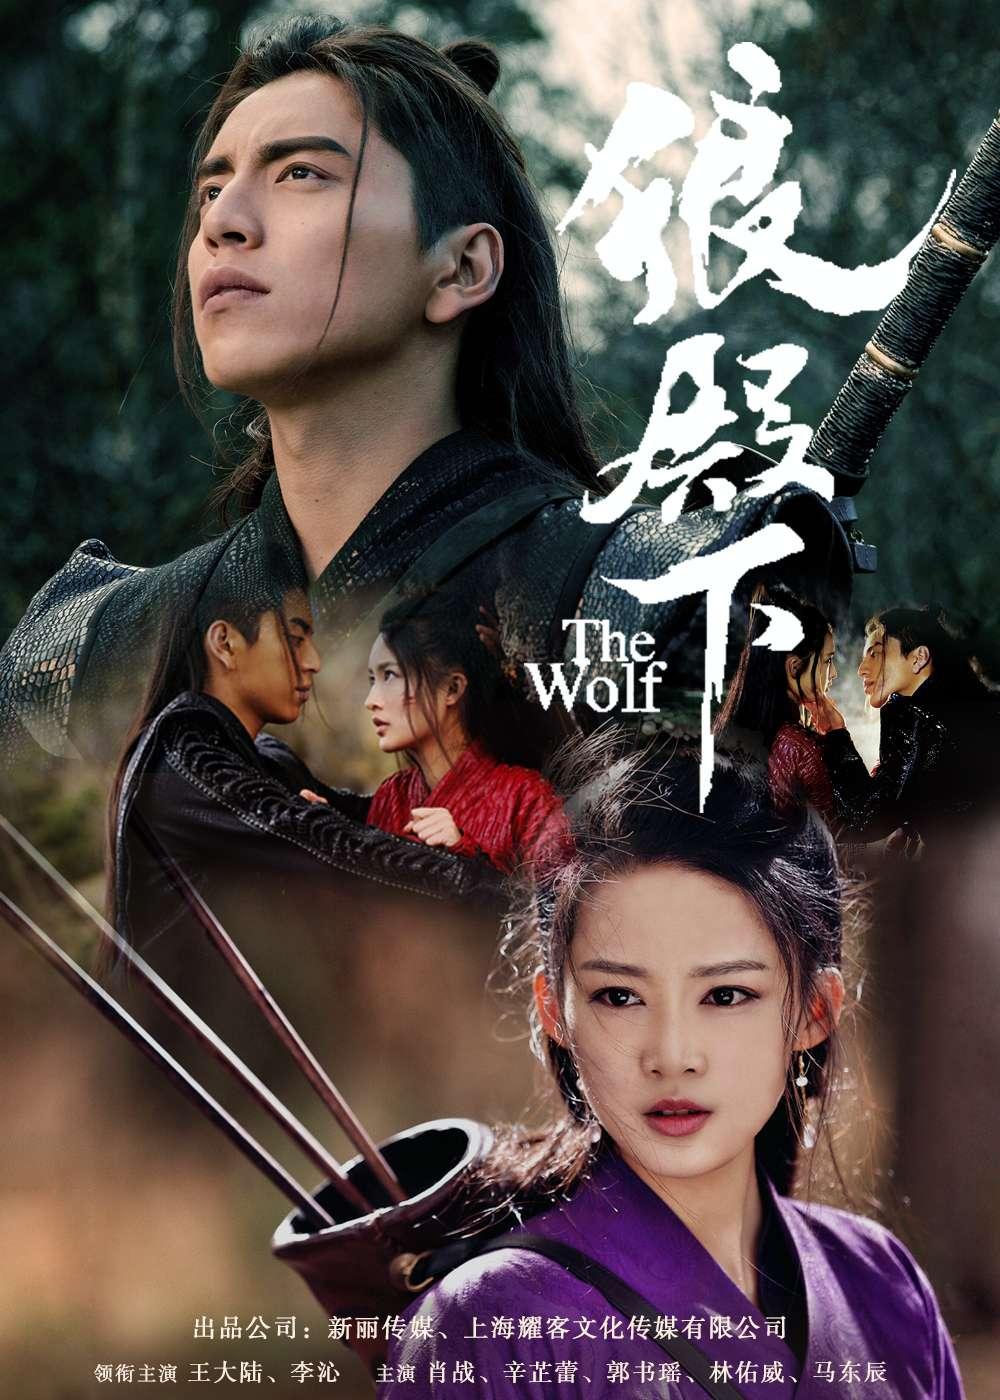 The Wolf kapak